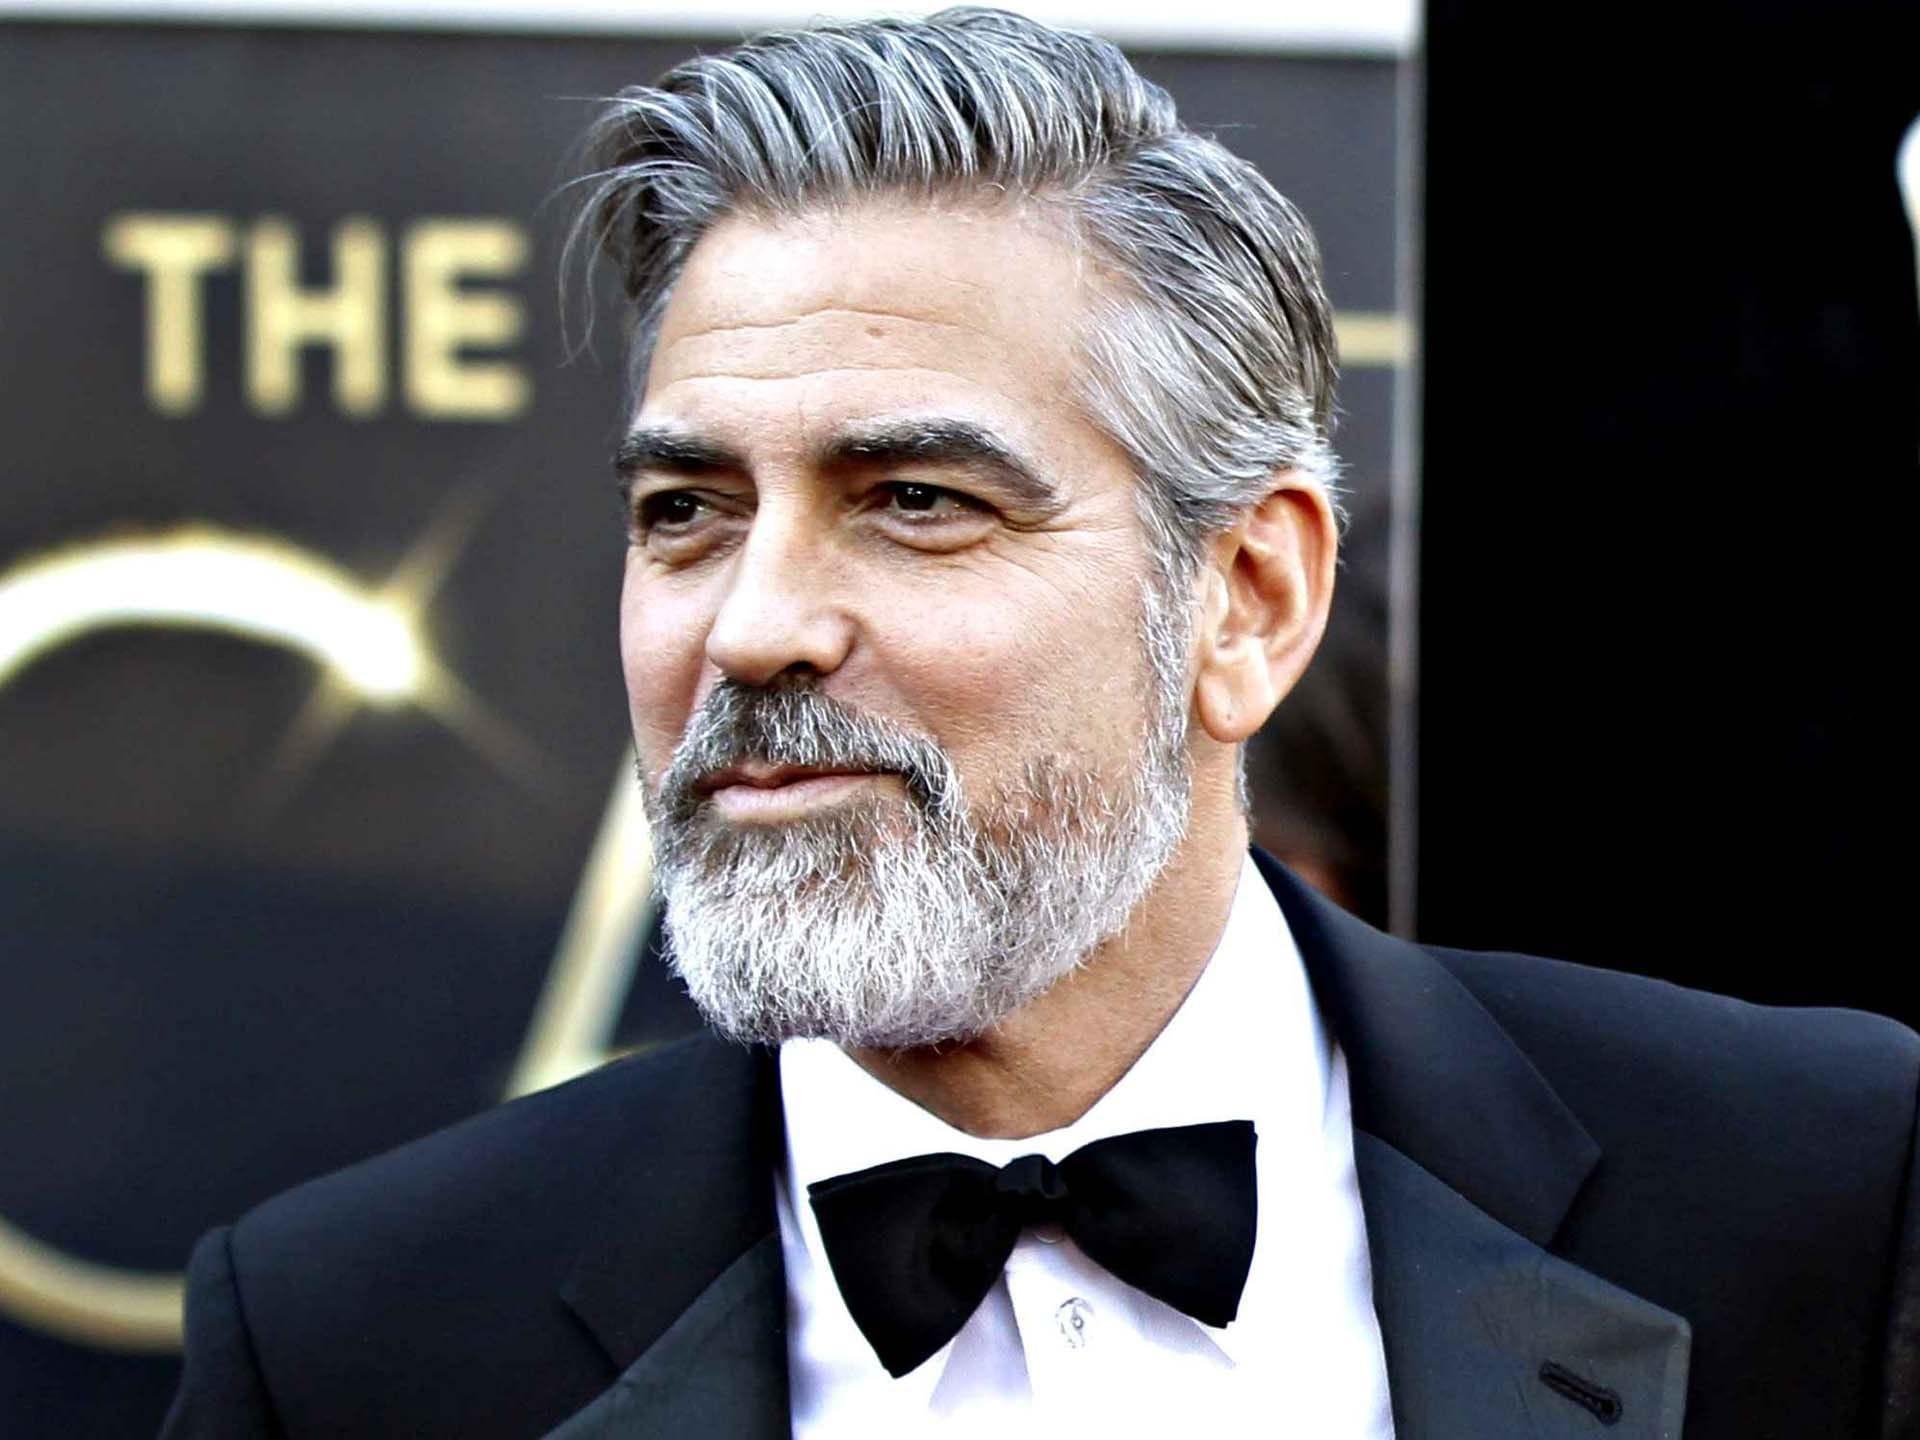 George Clooney HD Wallpapers 7wallpapersnet 1920x1440